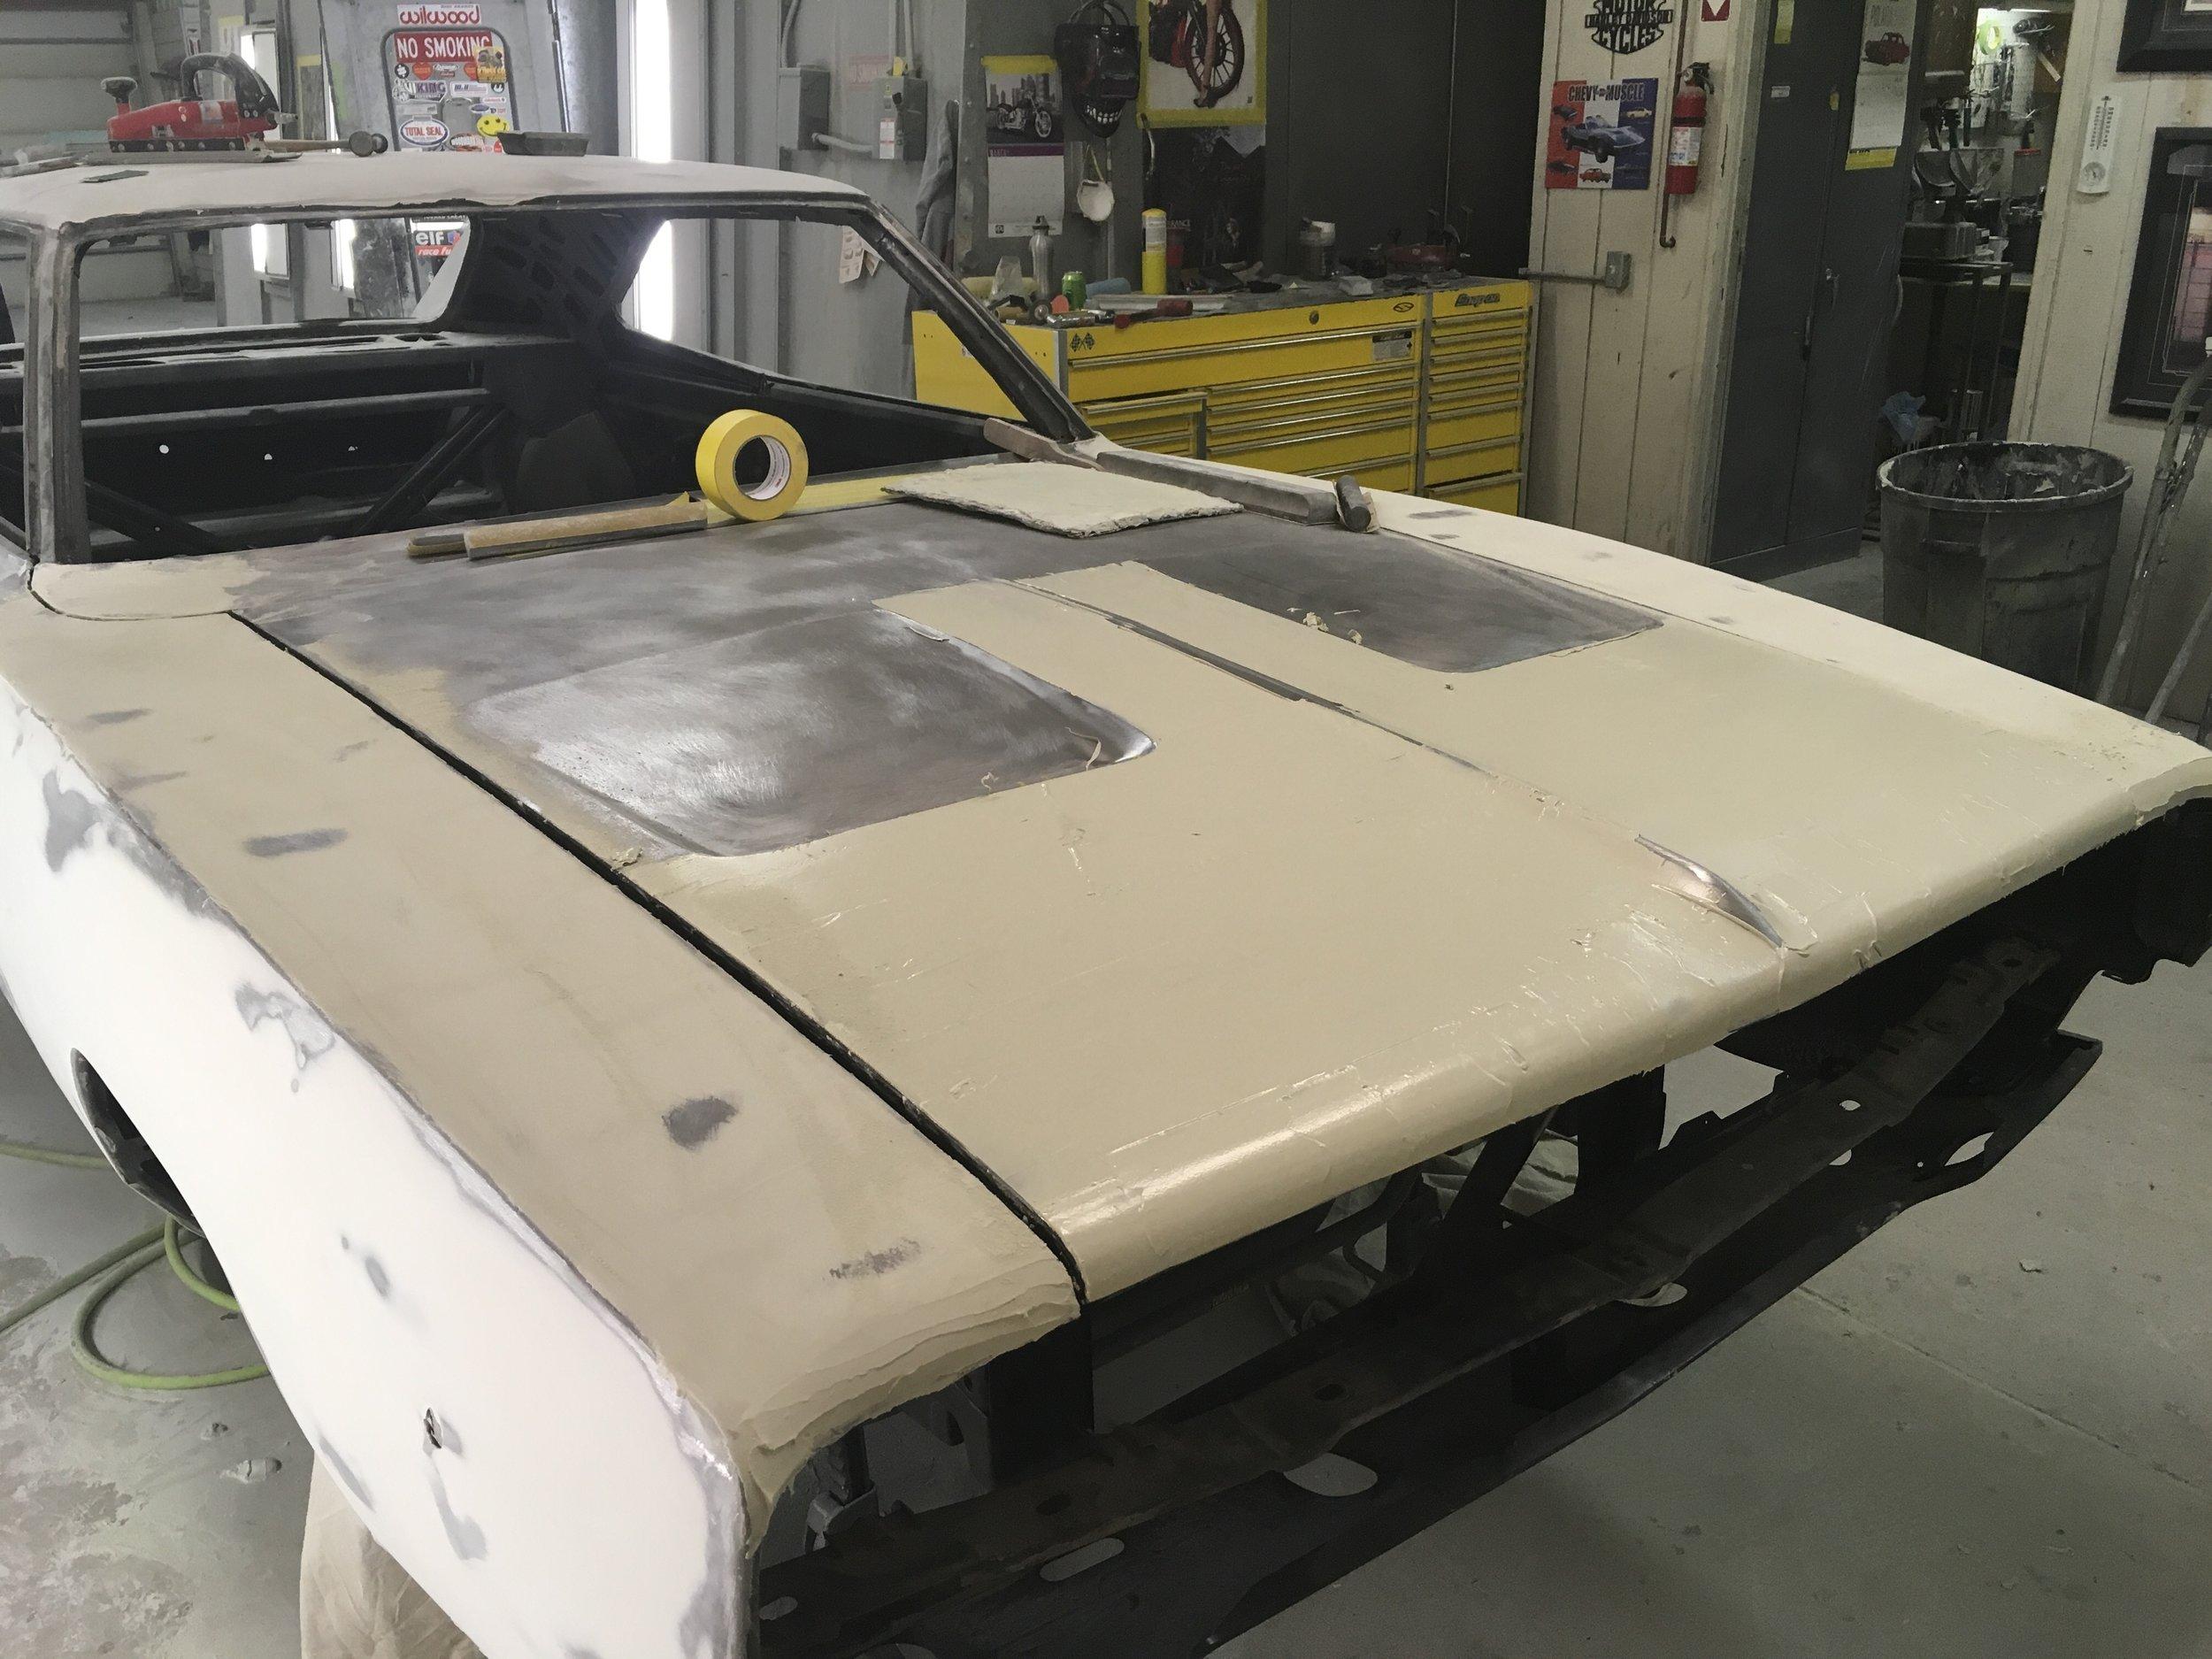 1968-Hell-Cat-Charger-minneapolis-hot-rod-custom-build-restoration-16.jpg